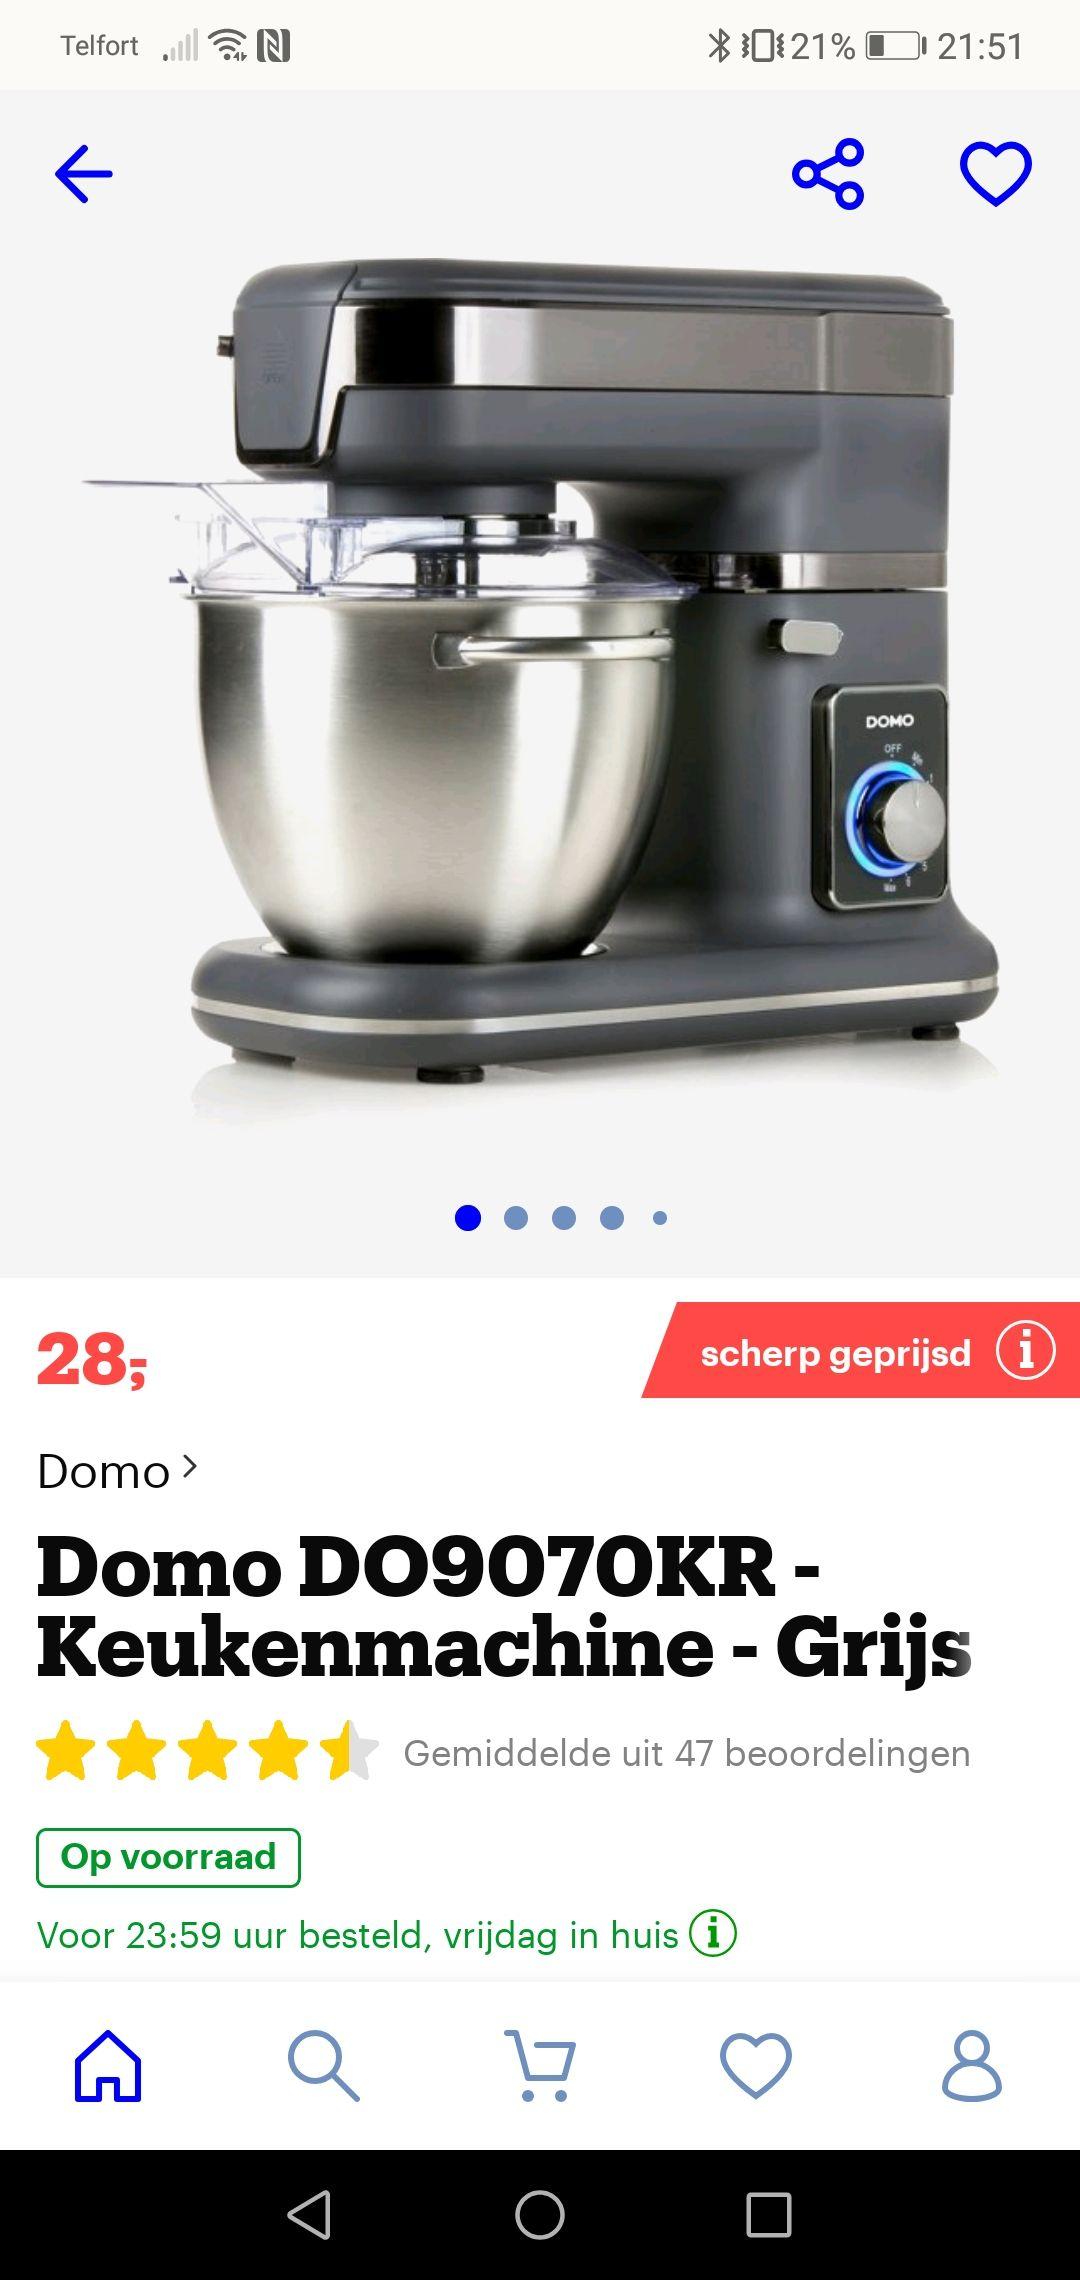 Prijsfout? Domo DO9070KR - Keukenrobot - Grijs